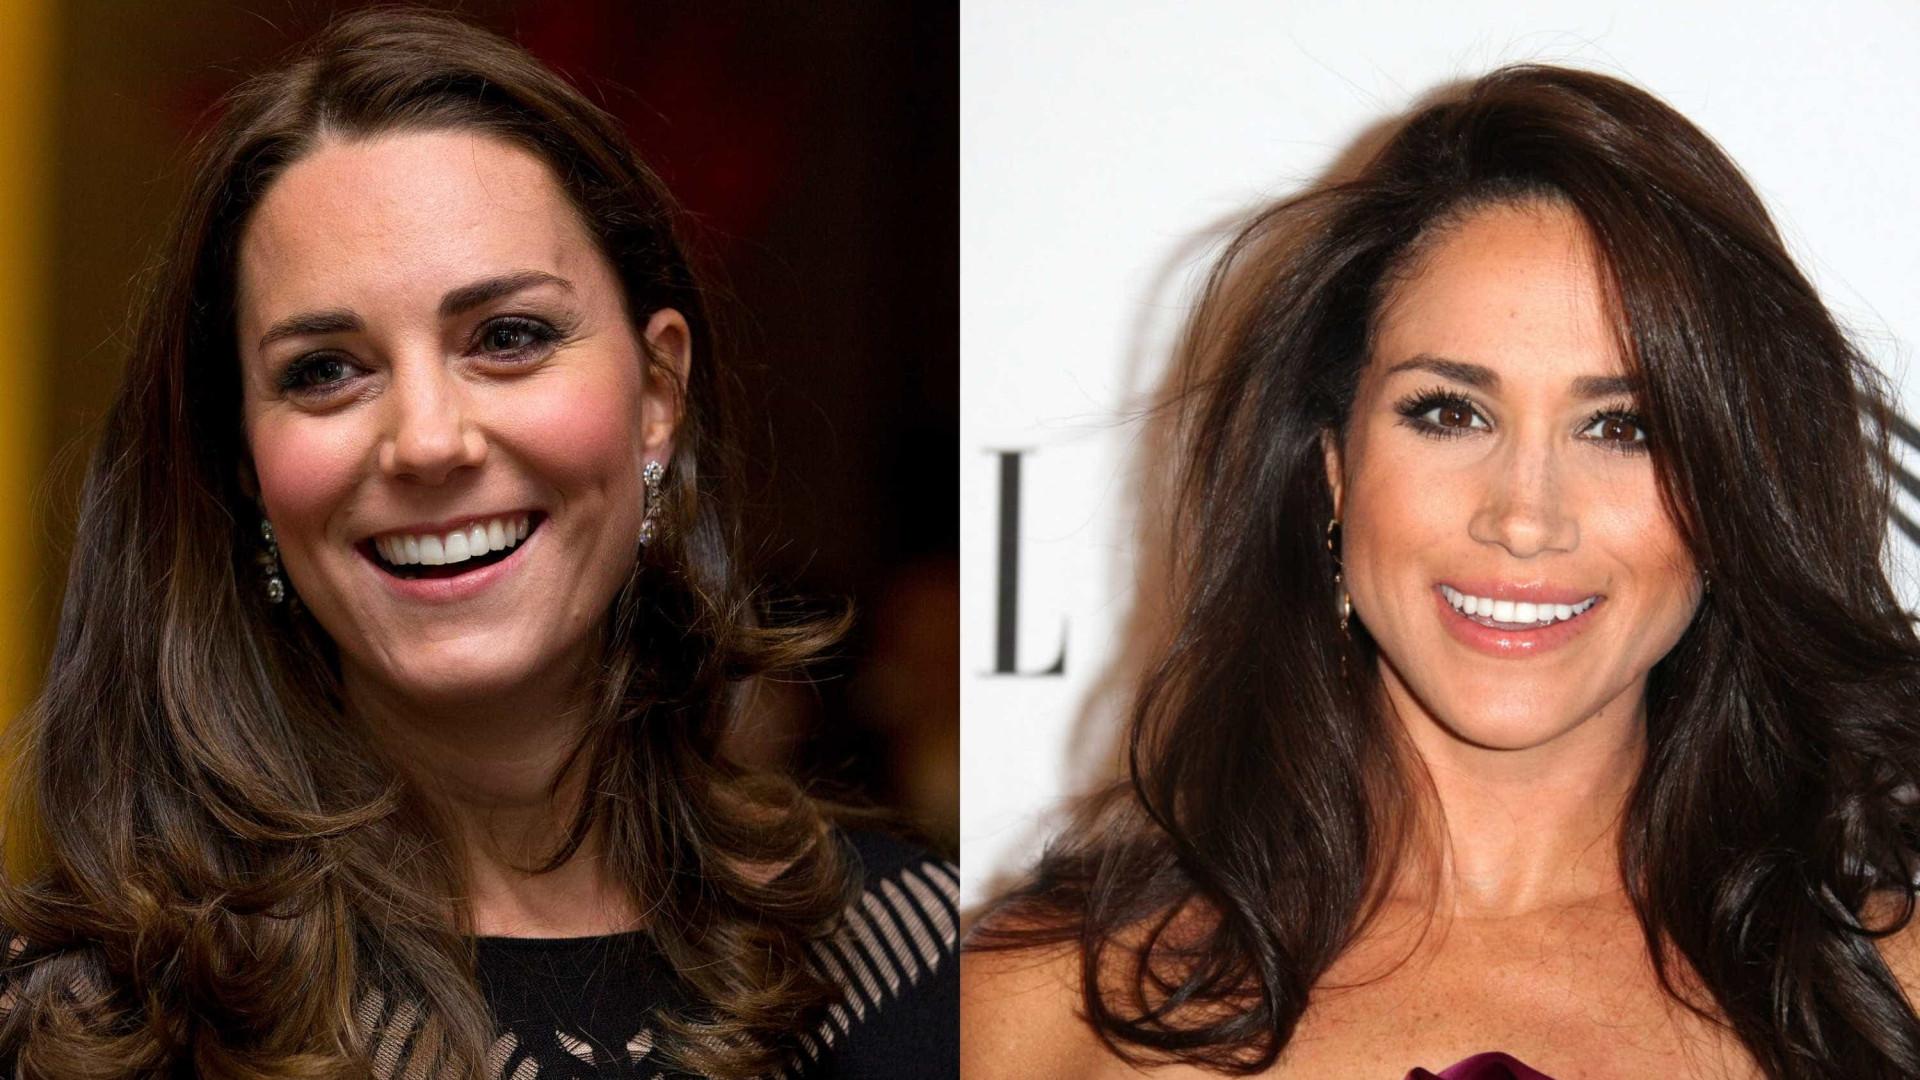 Príncipe Harry e Meghan Markle casam-se a 19 de maio